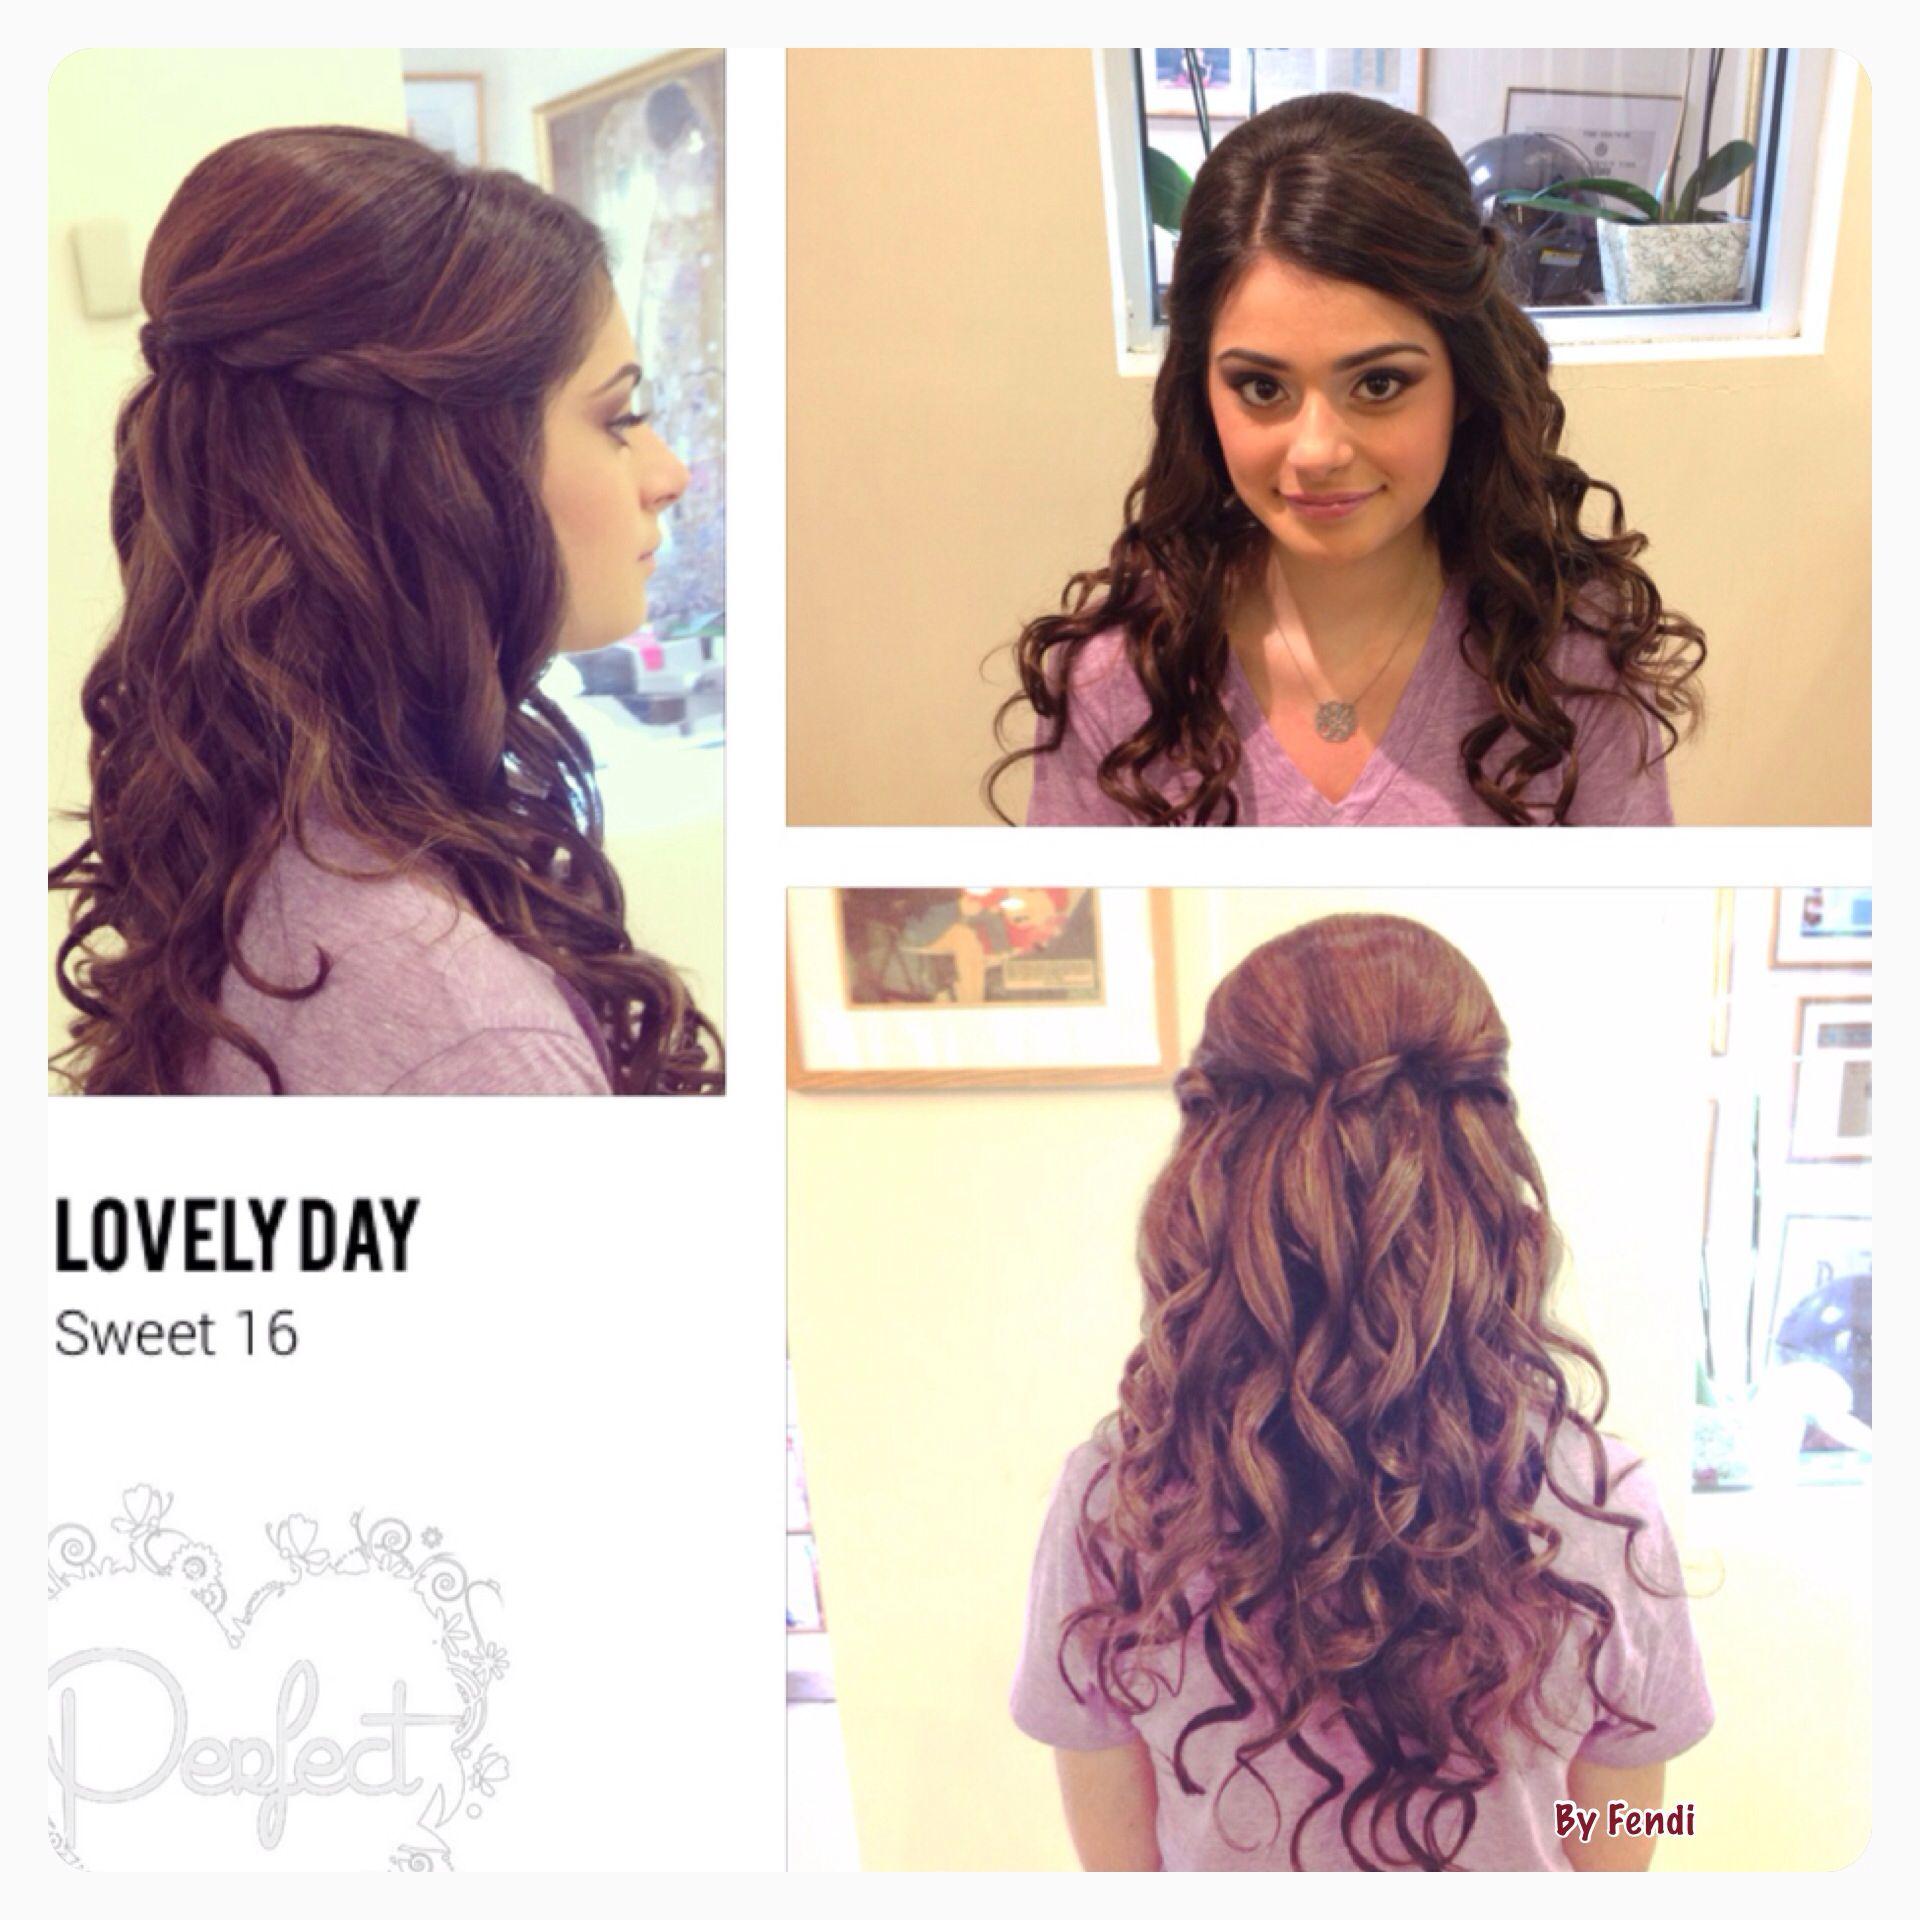 sweet 16 hairstyle ! | sweet 16 ideas | sweet 16 hairstyles